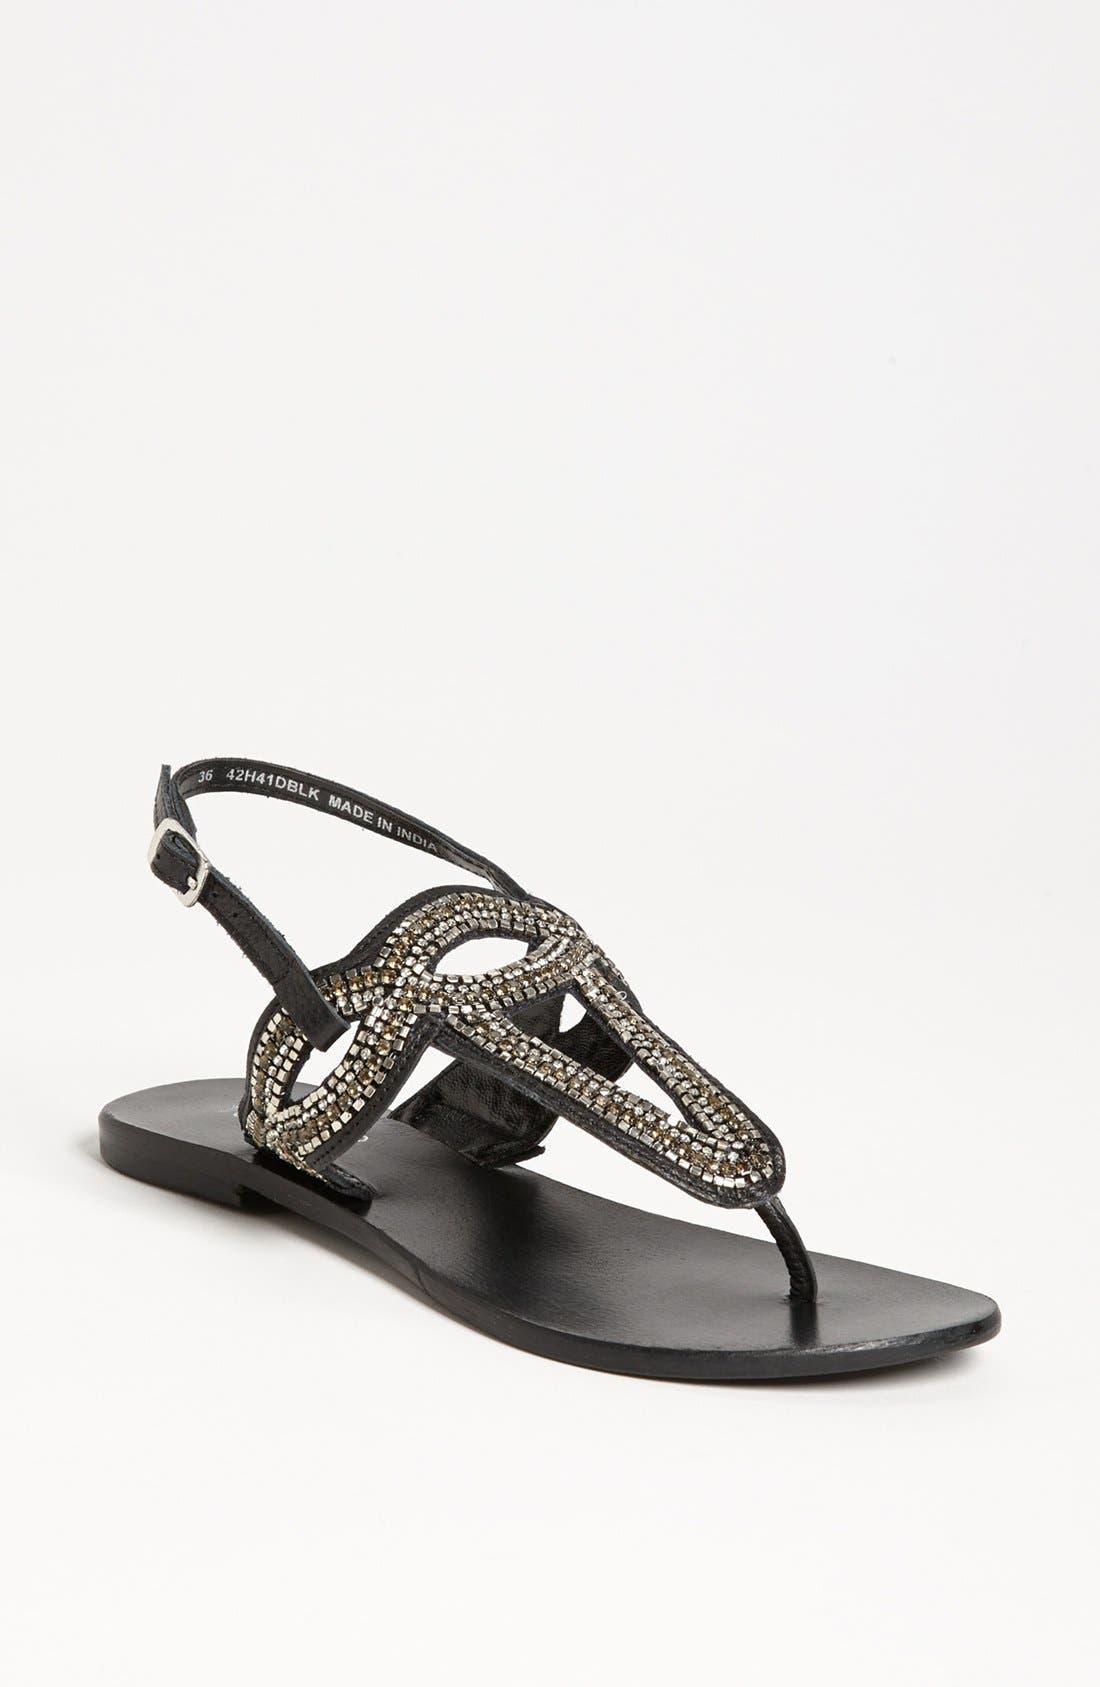 Alternate Image 1 Selected - Topshop 'Hectic' Sandal